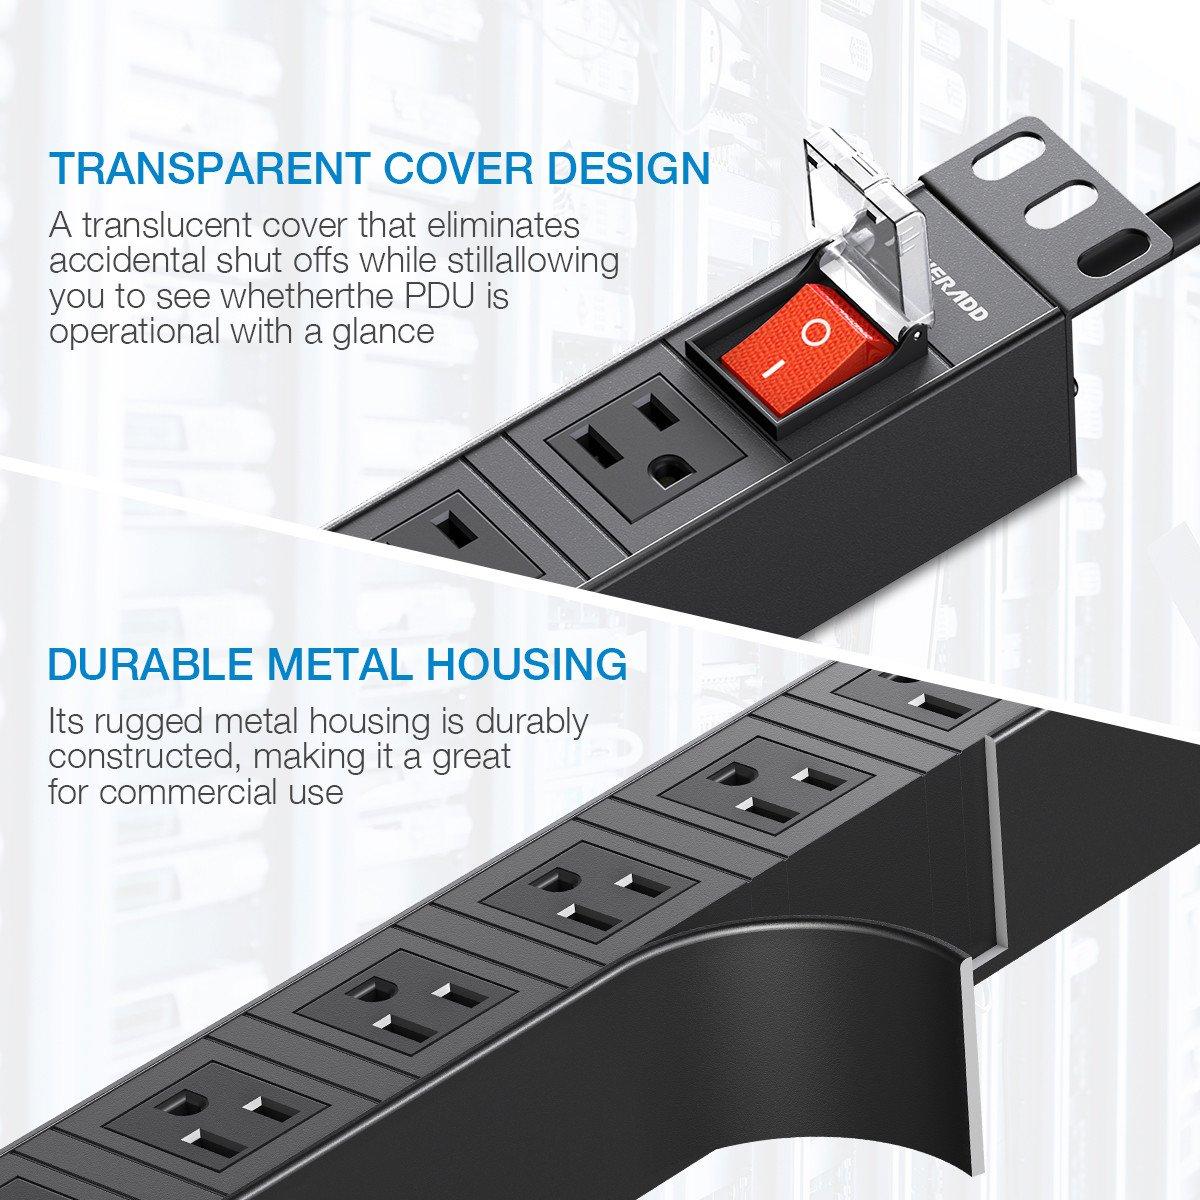 POWERADD PDU Power Strip PDU Reckmount with 8 Wide-Spaced Outlets1U Rackmount 6.5ft Heavy Duty Cord 2500W